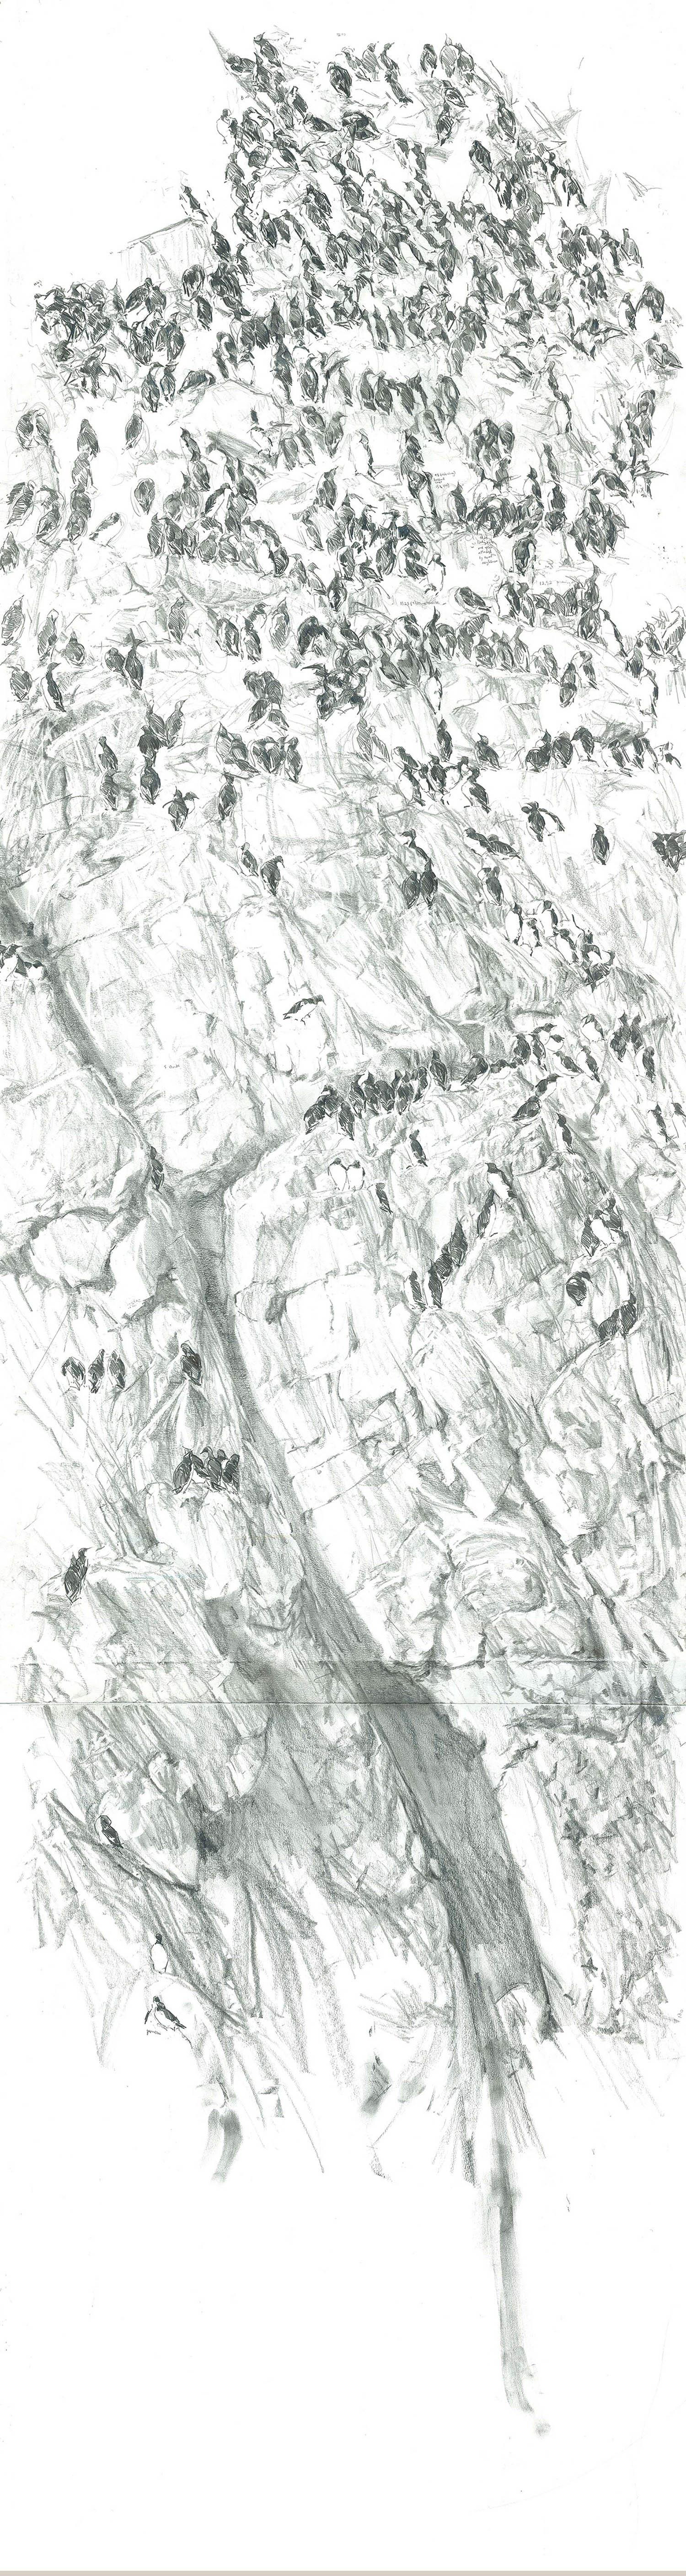 HOME_2500_bullhole_skomer_loomery_drawing_art_Installation_wildlife_guillemot_graphite_wallbank.jpg